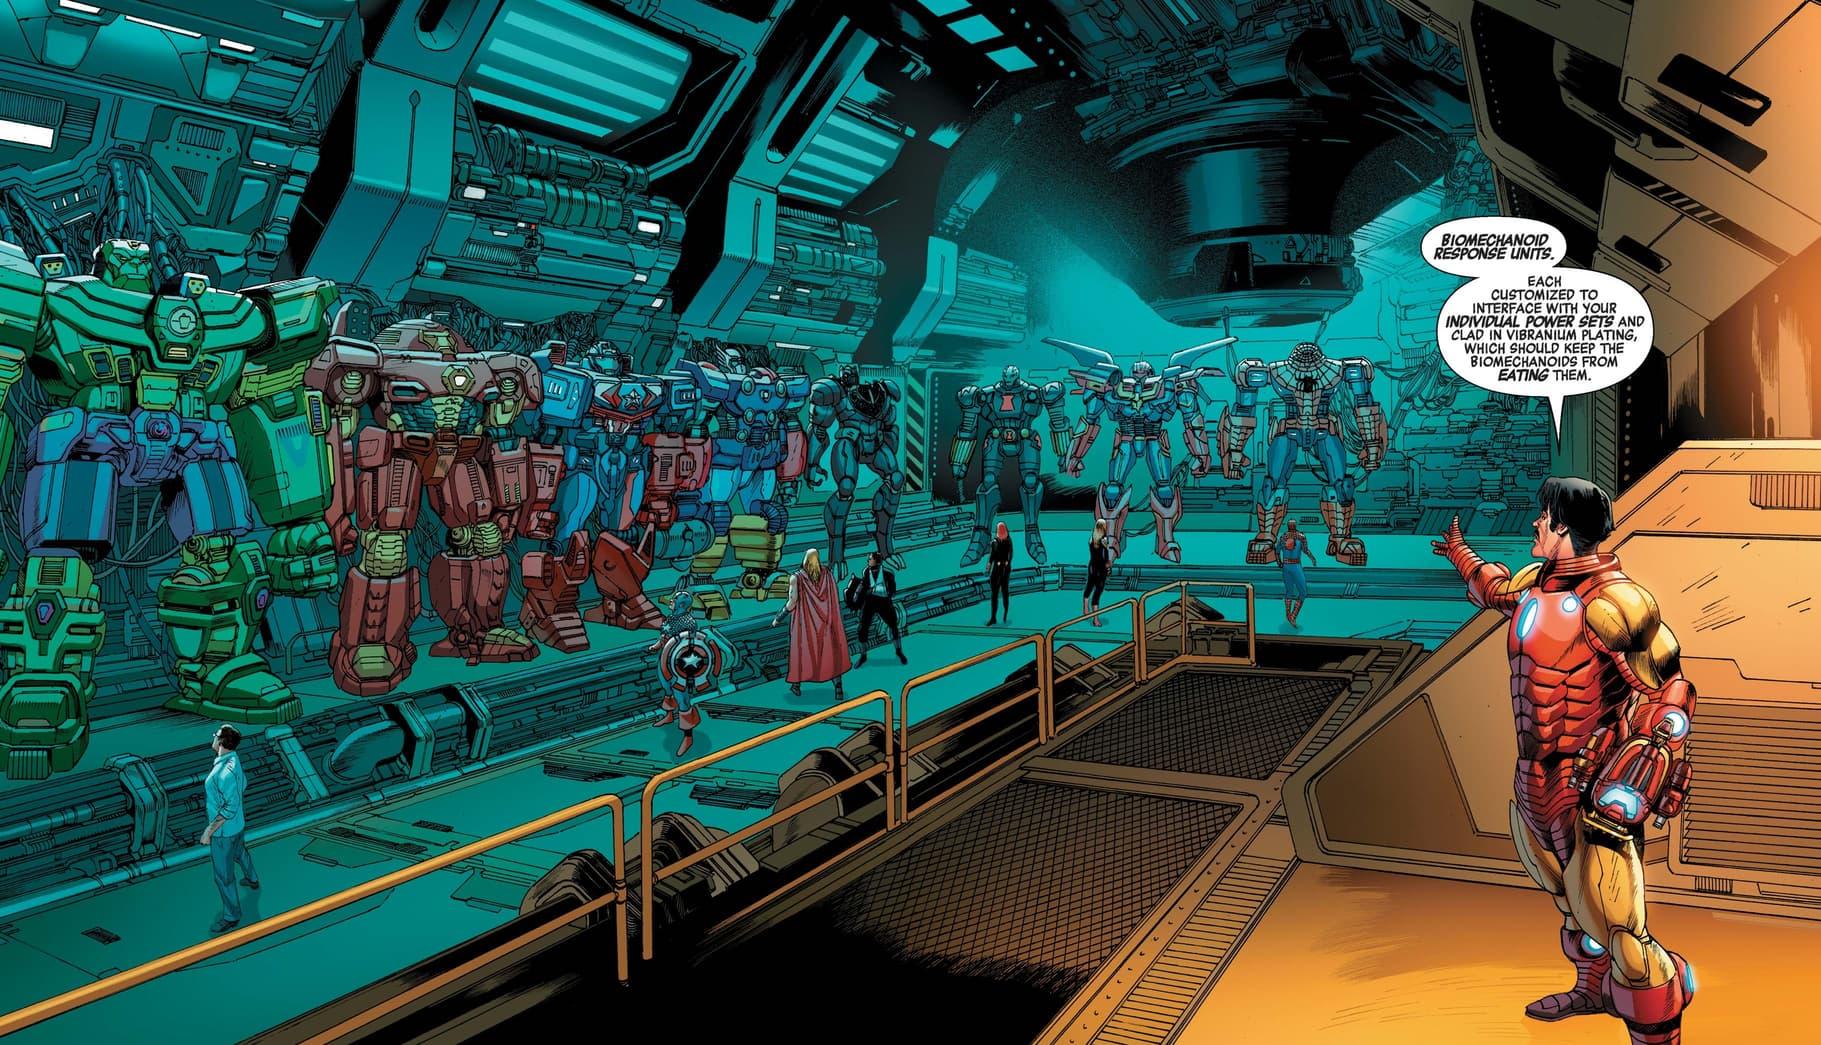 Tony Stark reveals the mech suit arsenal.